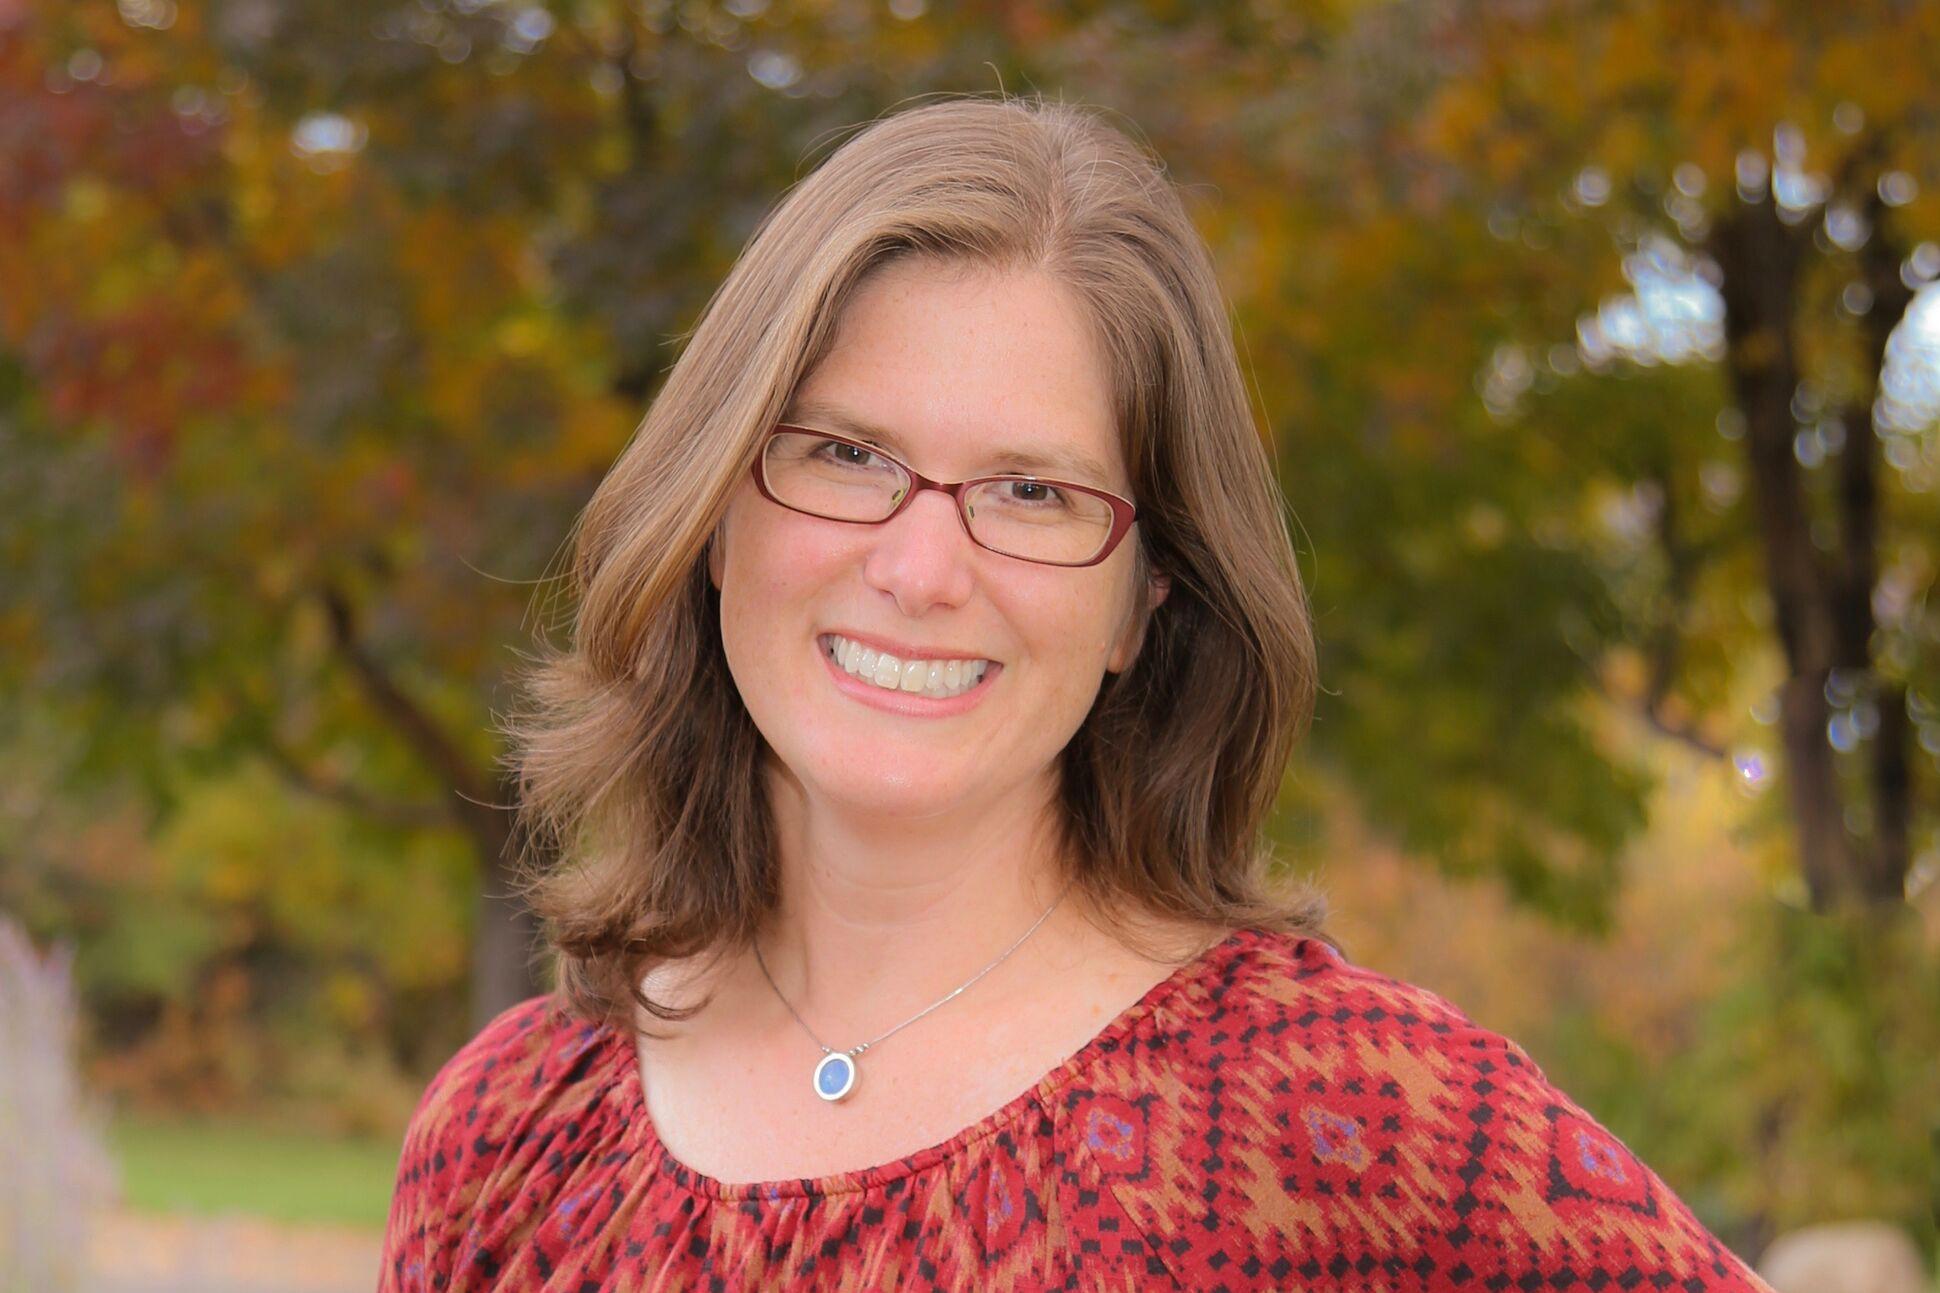 Image of Emily Perez